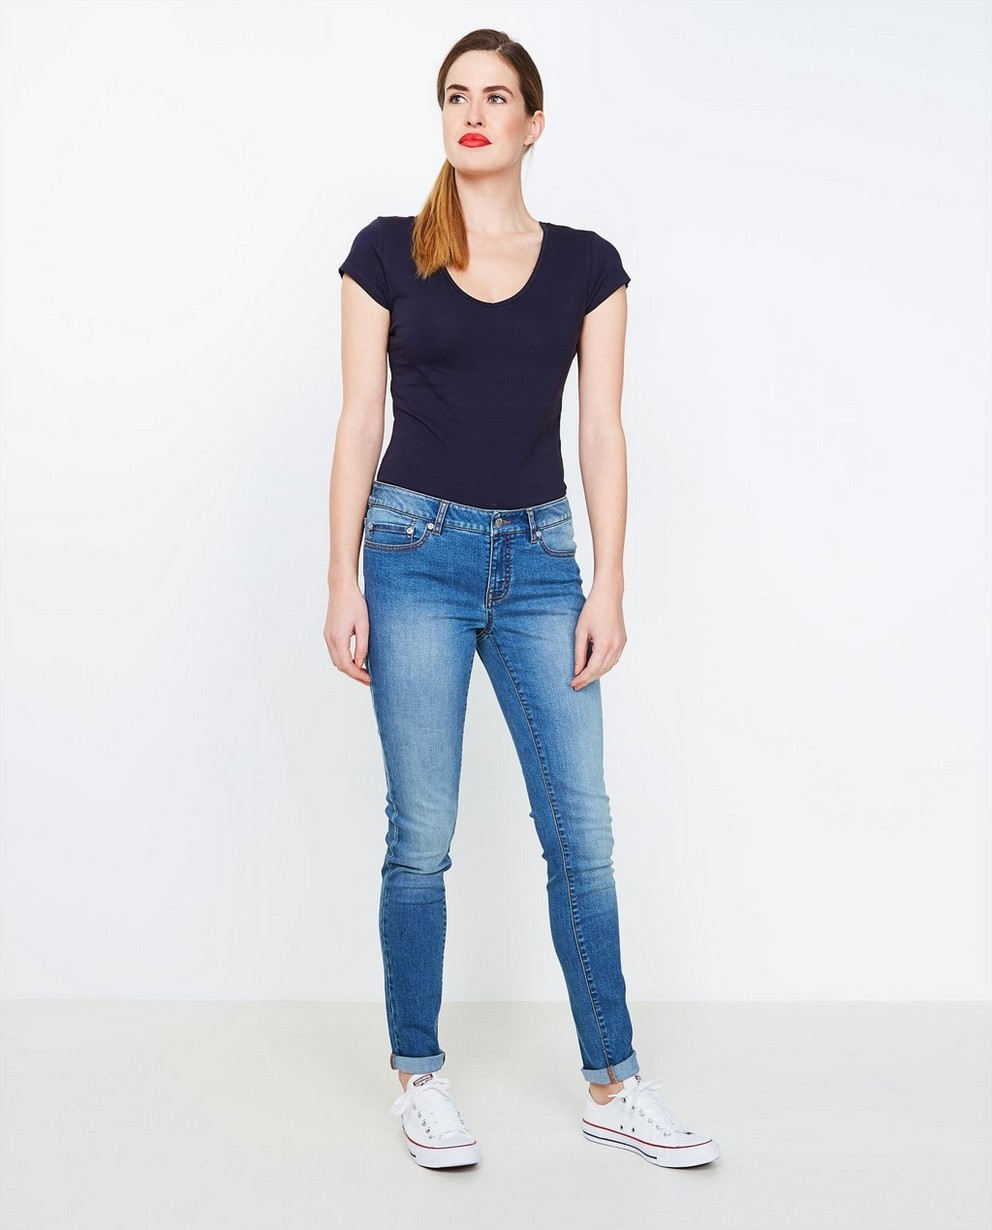 Jeans - aqua - Blauwe skinny jeans